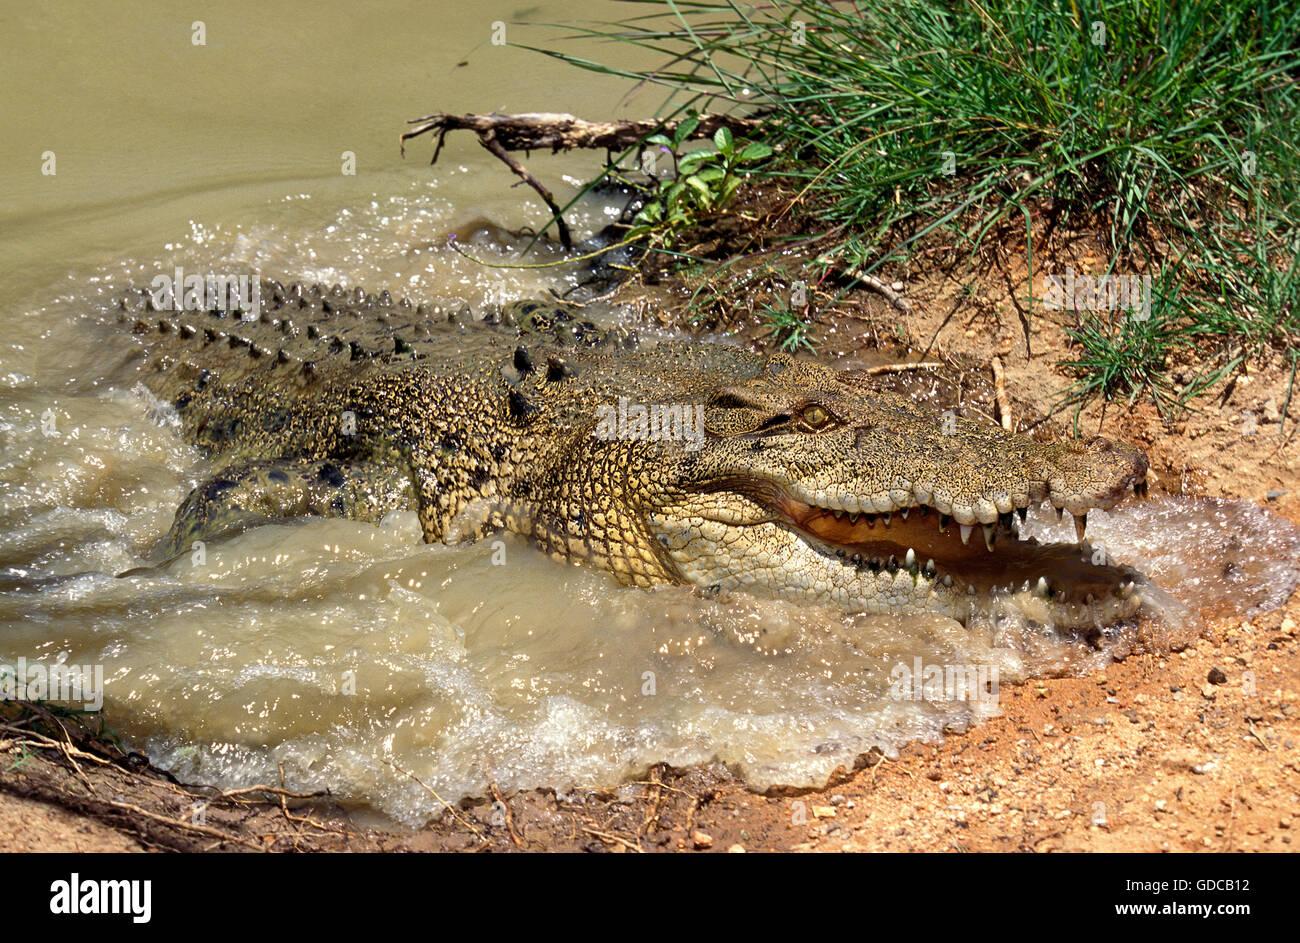 AUSTRALIAN SALWATER CROCODILE OR ESTUARINE CROCODILE crocodylus porosus, ADULT COMING OUT WATER, AUSTRALIA - Stock Image